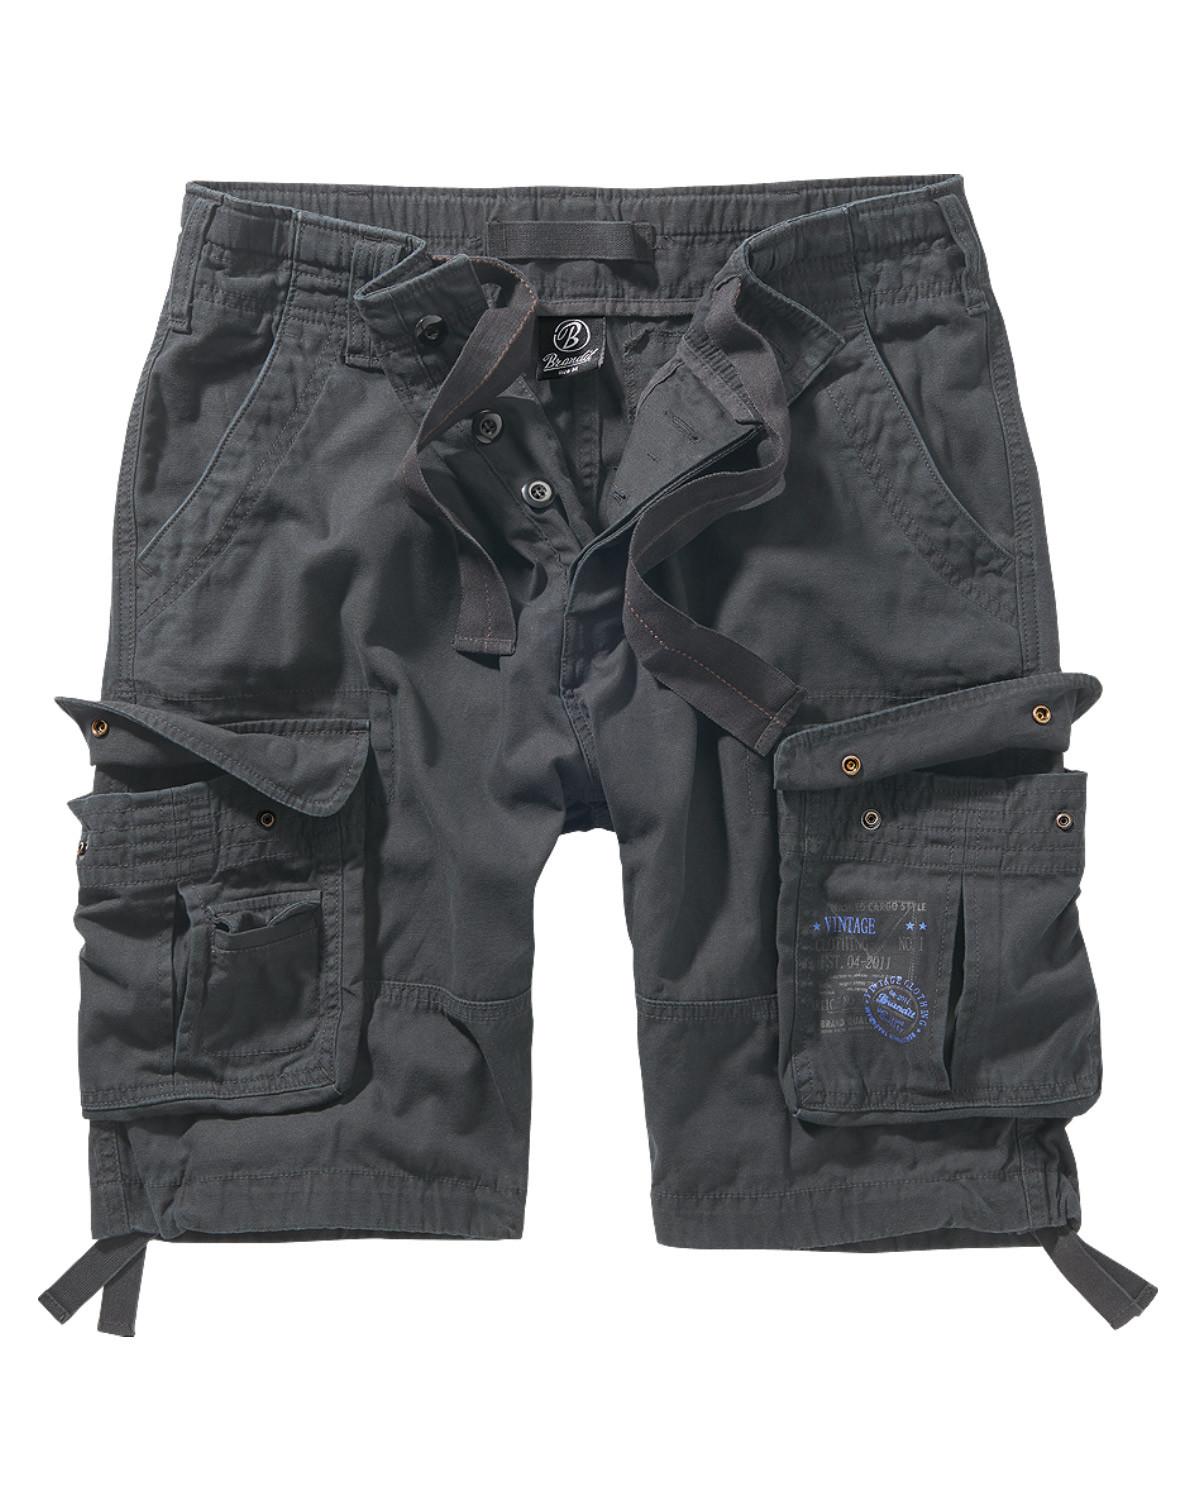 Image of   Brandit Pure Vintage Shorts (Anthrazit, 2XL)